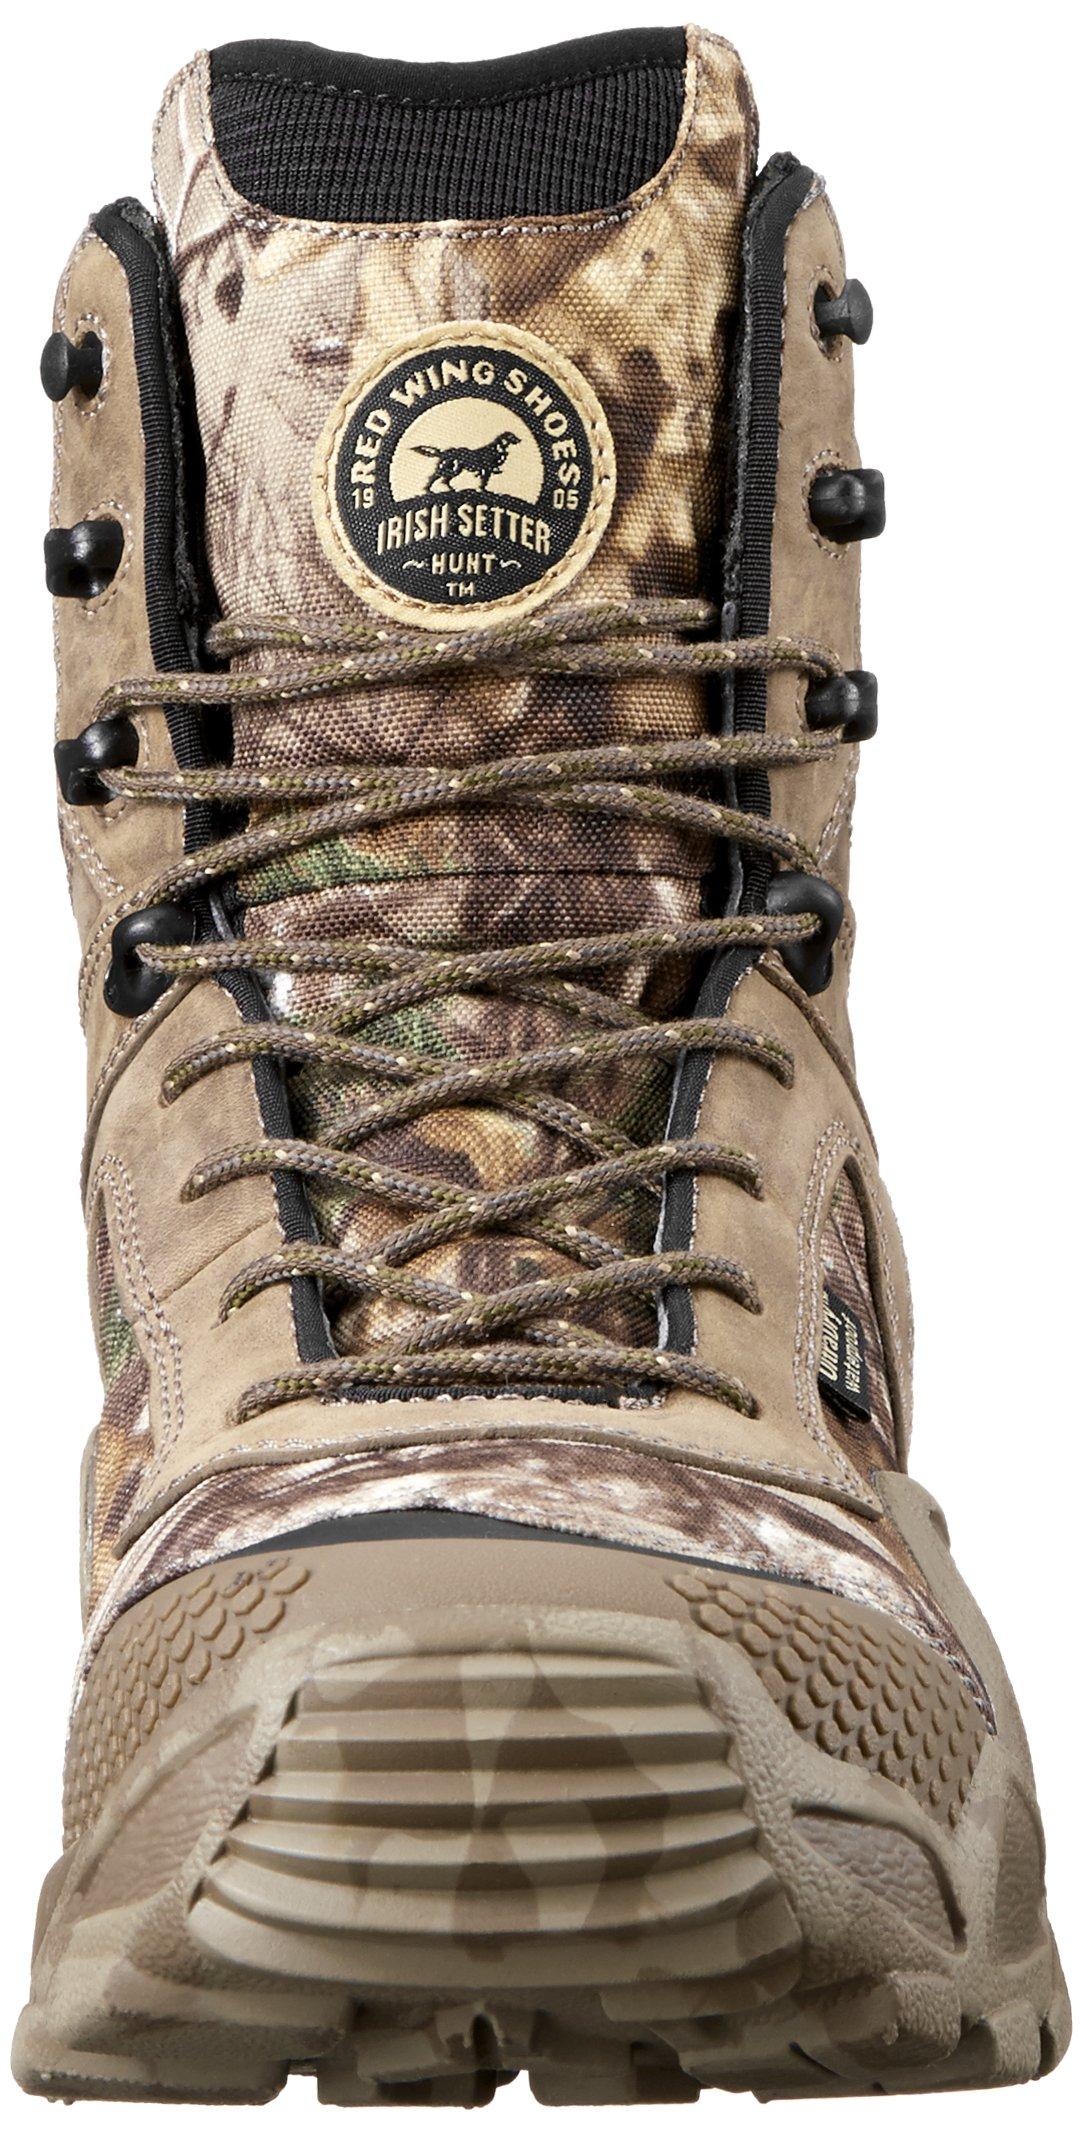 Irish Setter Men's 2870 Vaprtrek Waterproof 8'' Hunting Boot, Realtree Xtra Camouflage,9.5 D US by Irish Setter (Image #4)